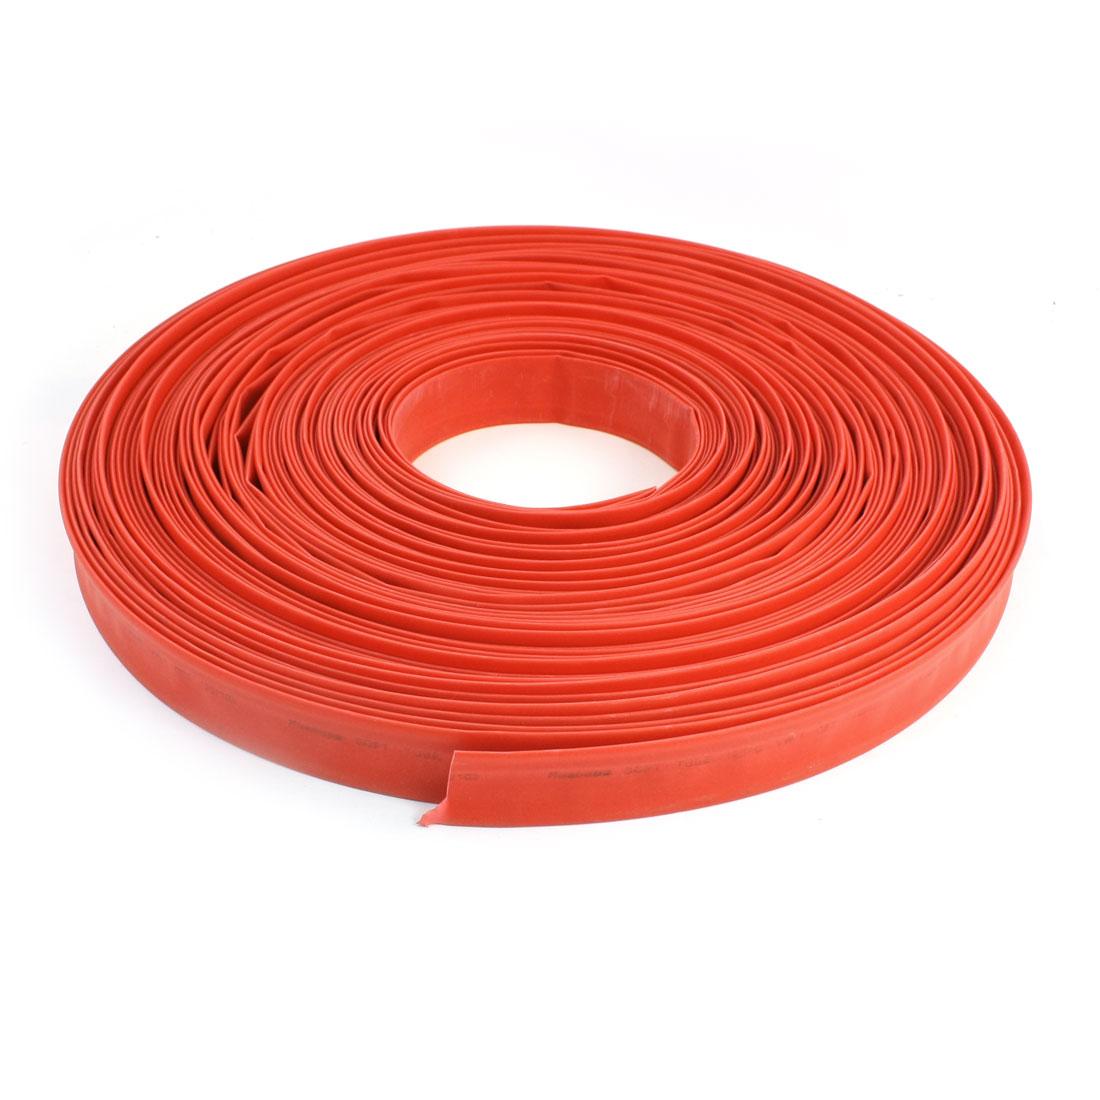 600V-Red-Polyolefin-20mm-2-1-Halogen-Free-Heat-Shrink-Tube-100M-328Ft